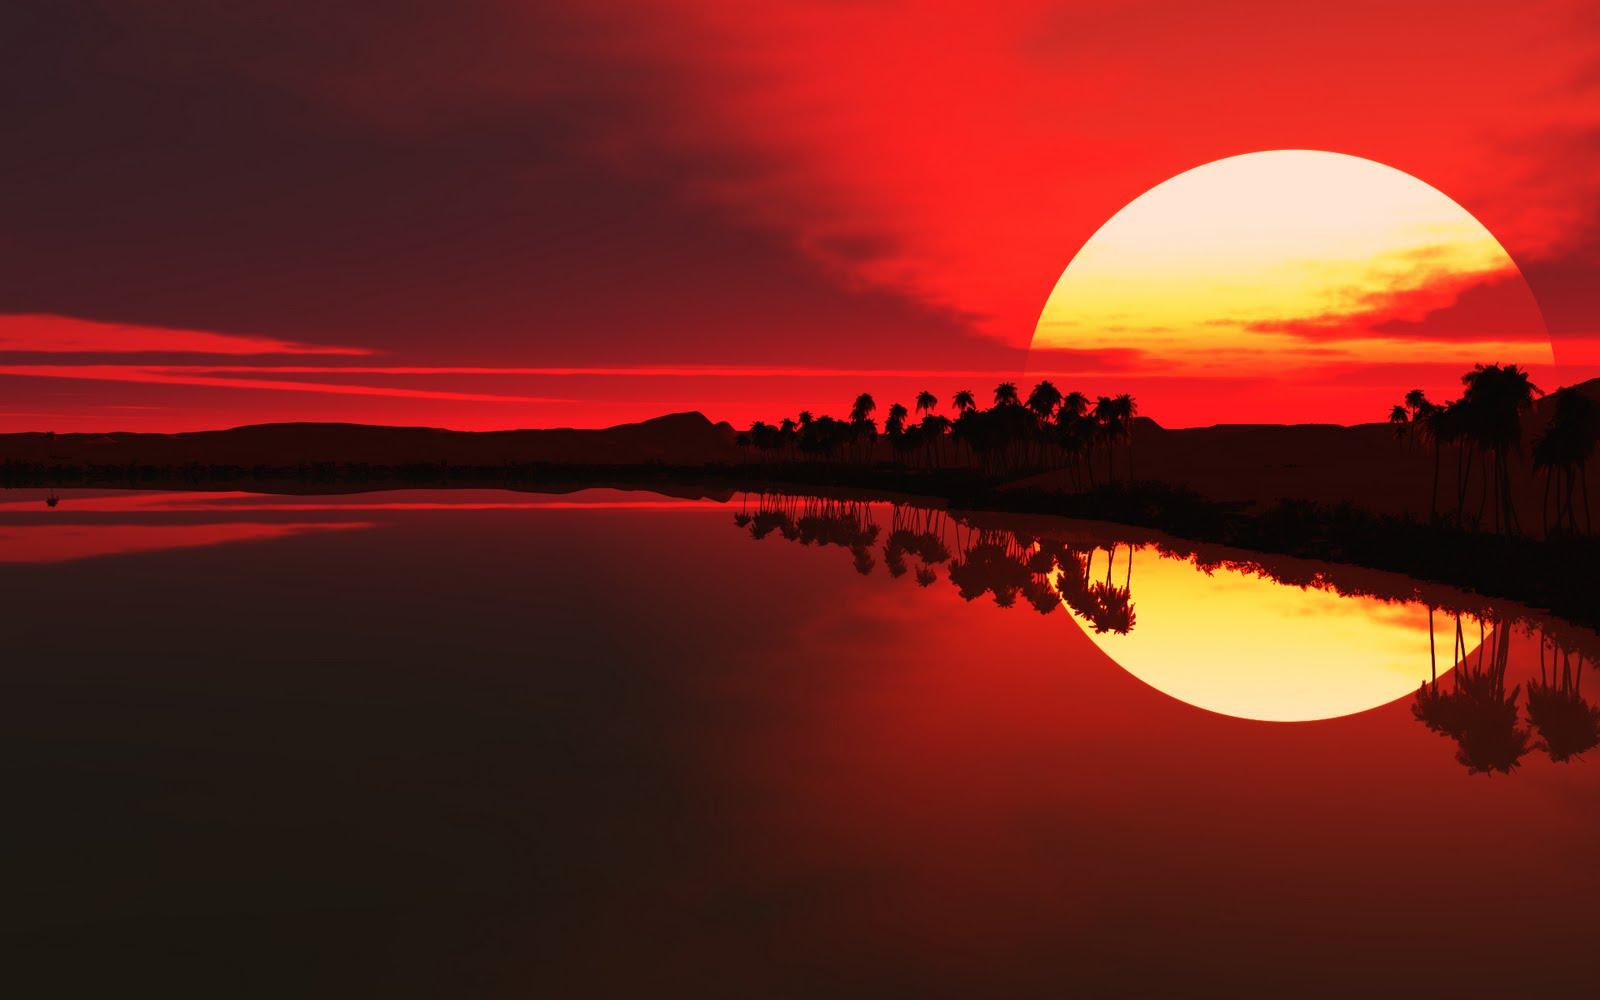 http://3.bp.blogspot.com/-iH7Emwq76ng/TgekFdbY0-I/AAAAAAAAAFY/luZUoybLIrY/s1600/Red-Sunset-wallpaper.jpg